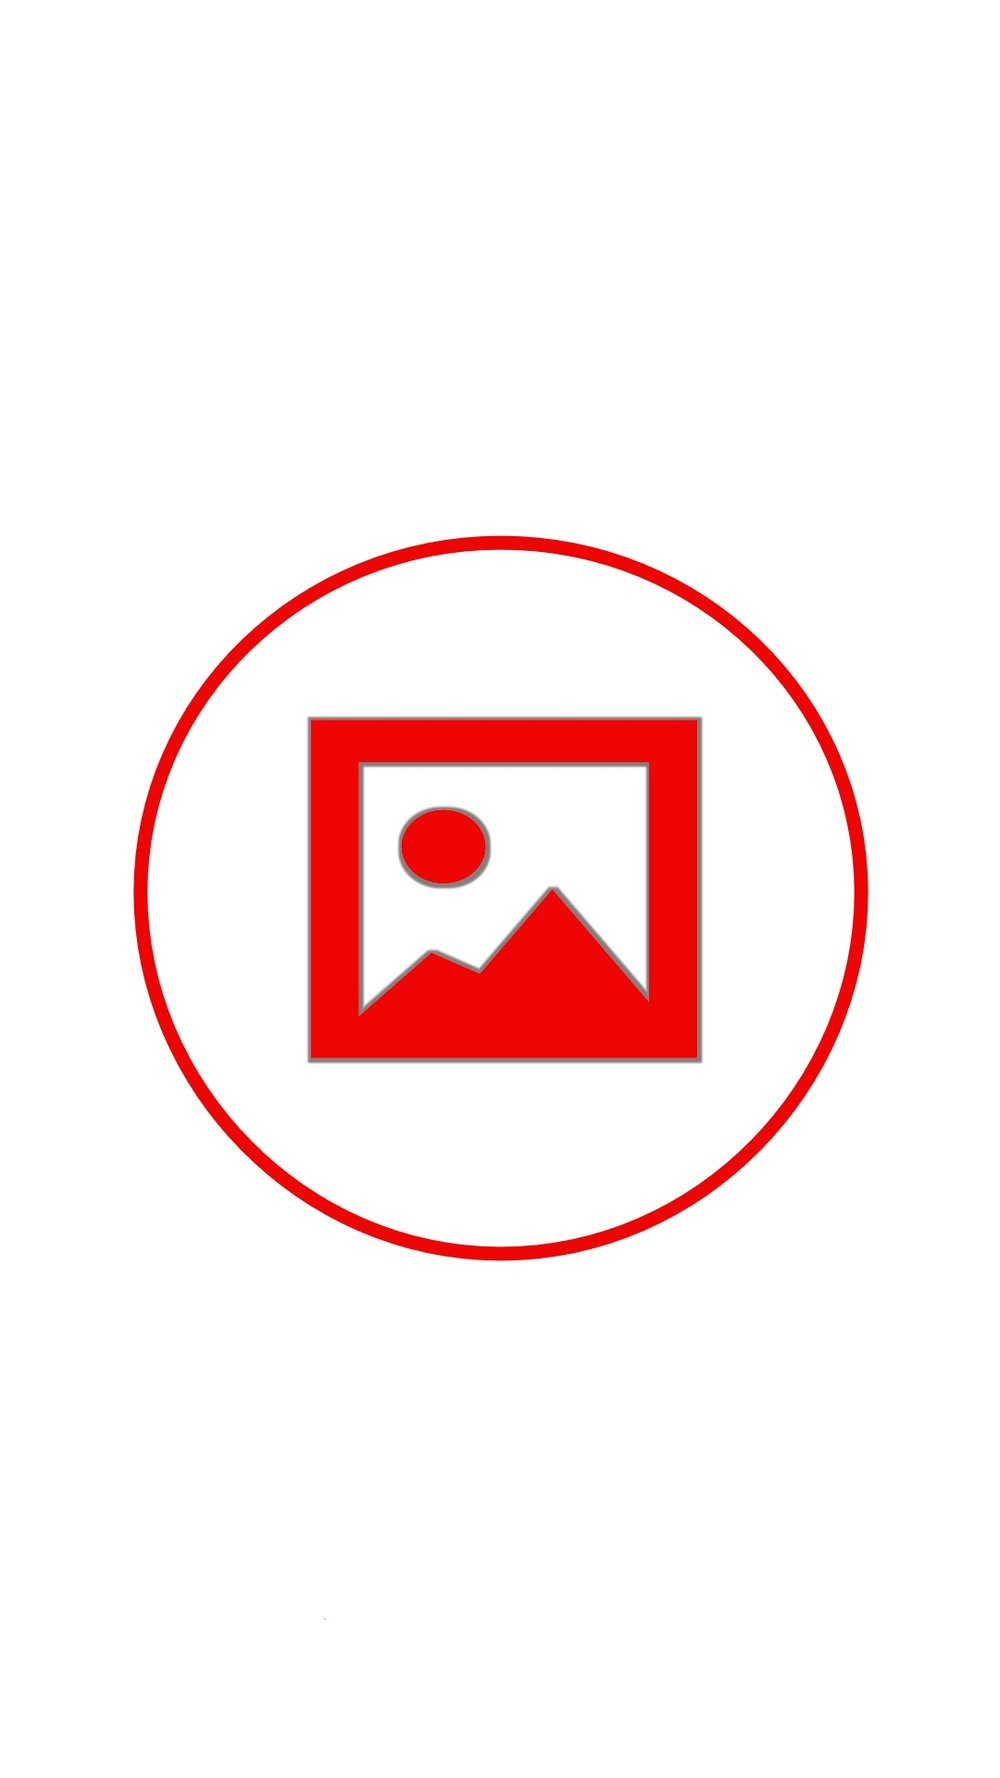 Instagram-cover-photo-red-white-lotnotes.com.jpg